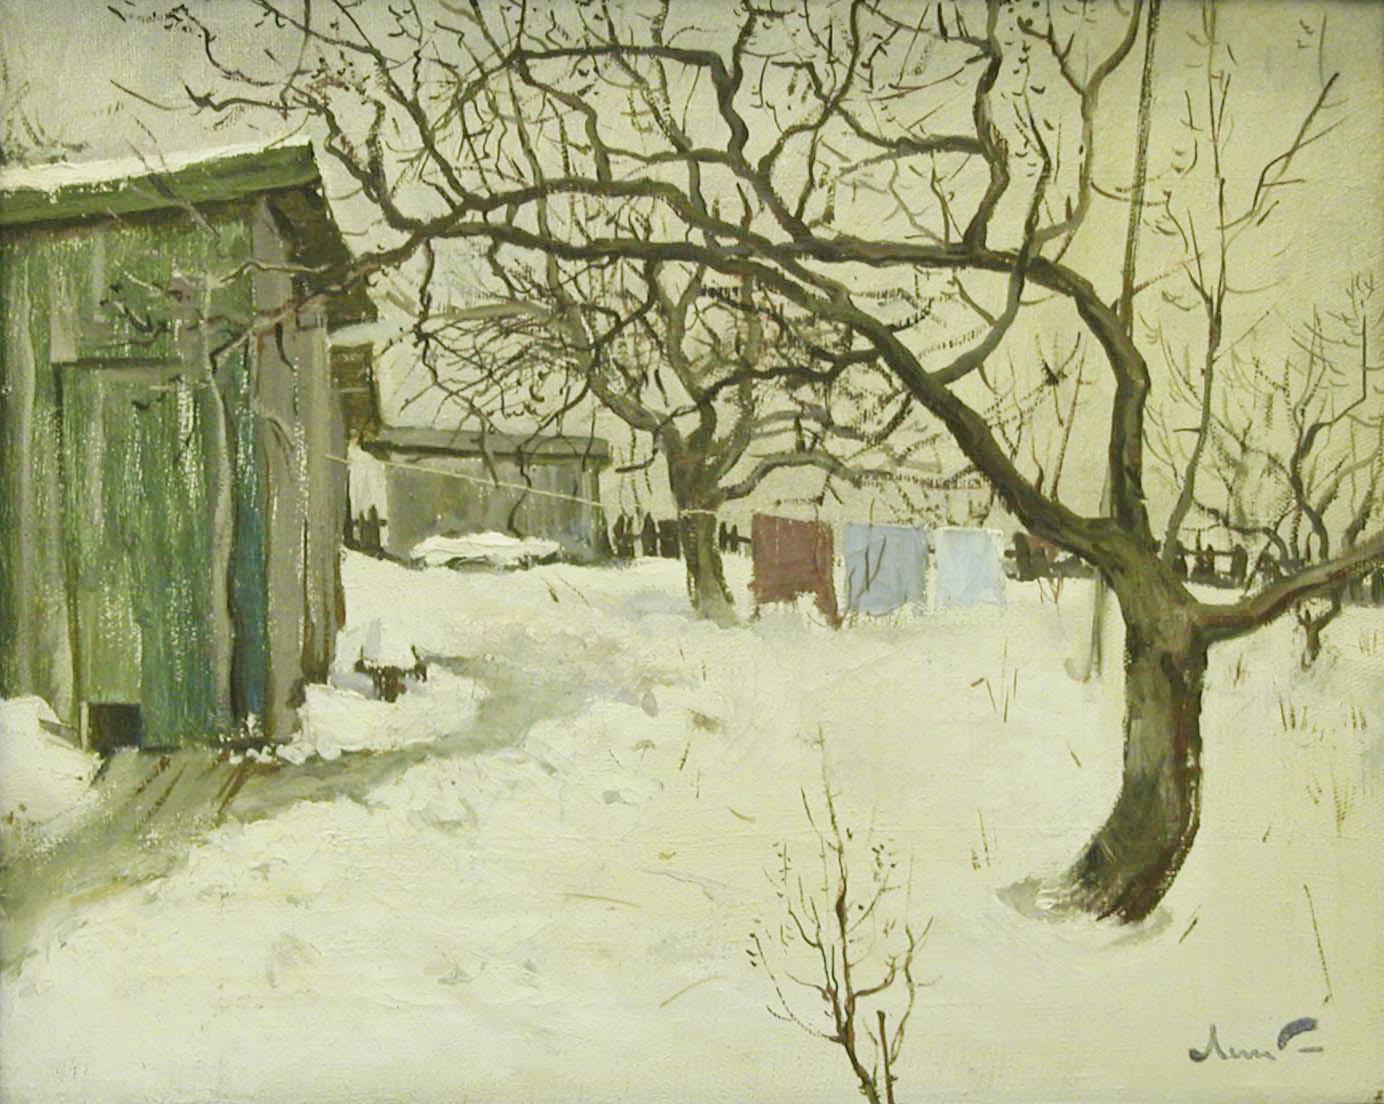 Виктор Лысюк. Зимний сад (1984). Из собрания Пушкинского заповедника